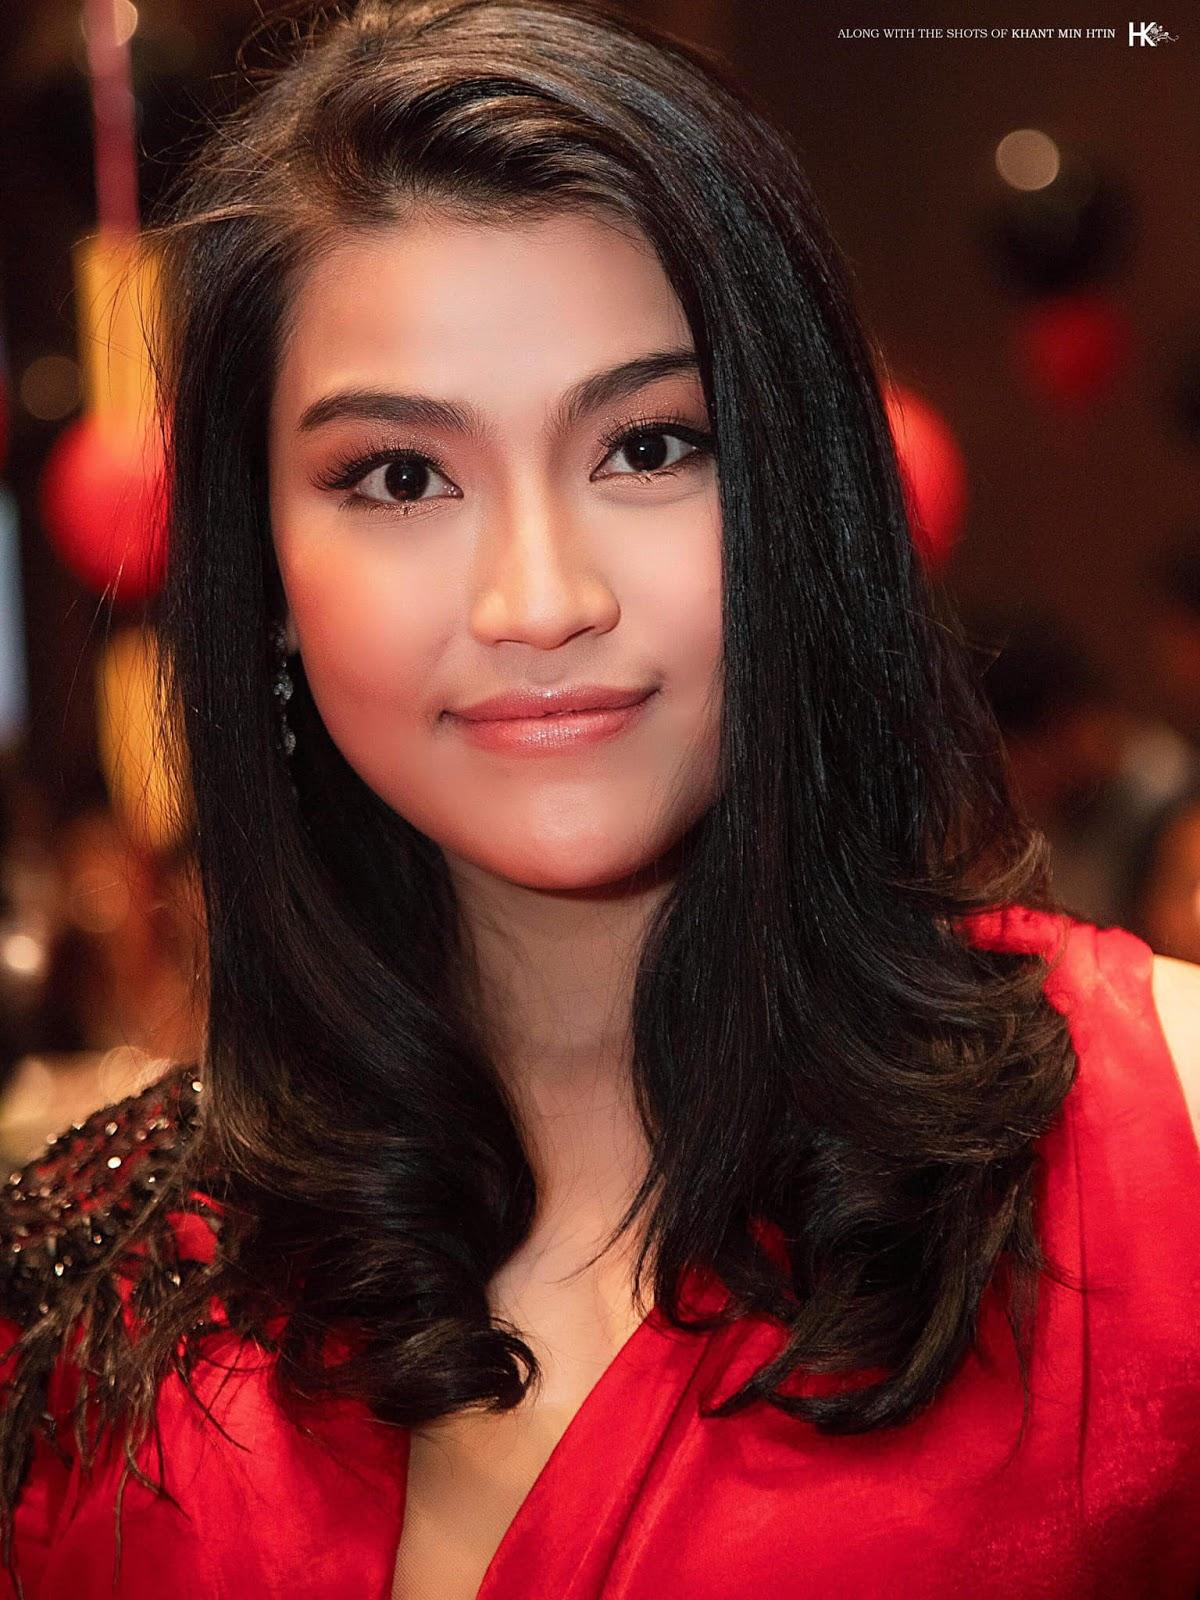 Happy Birthday Ei Chaw Po : Photos from Her Birthday Party